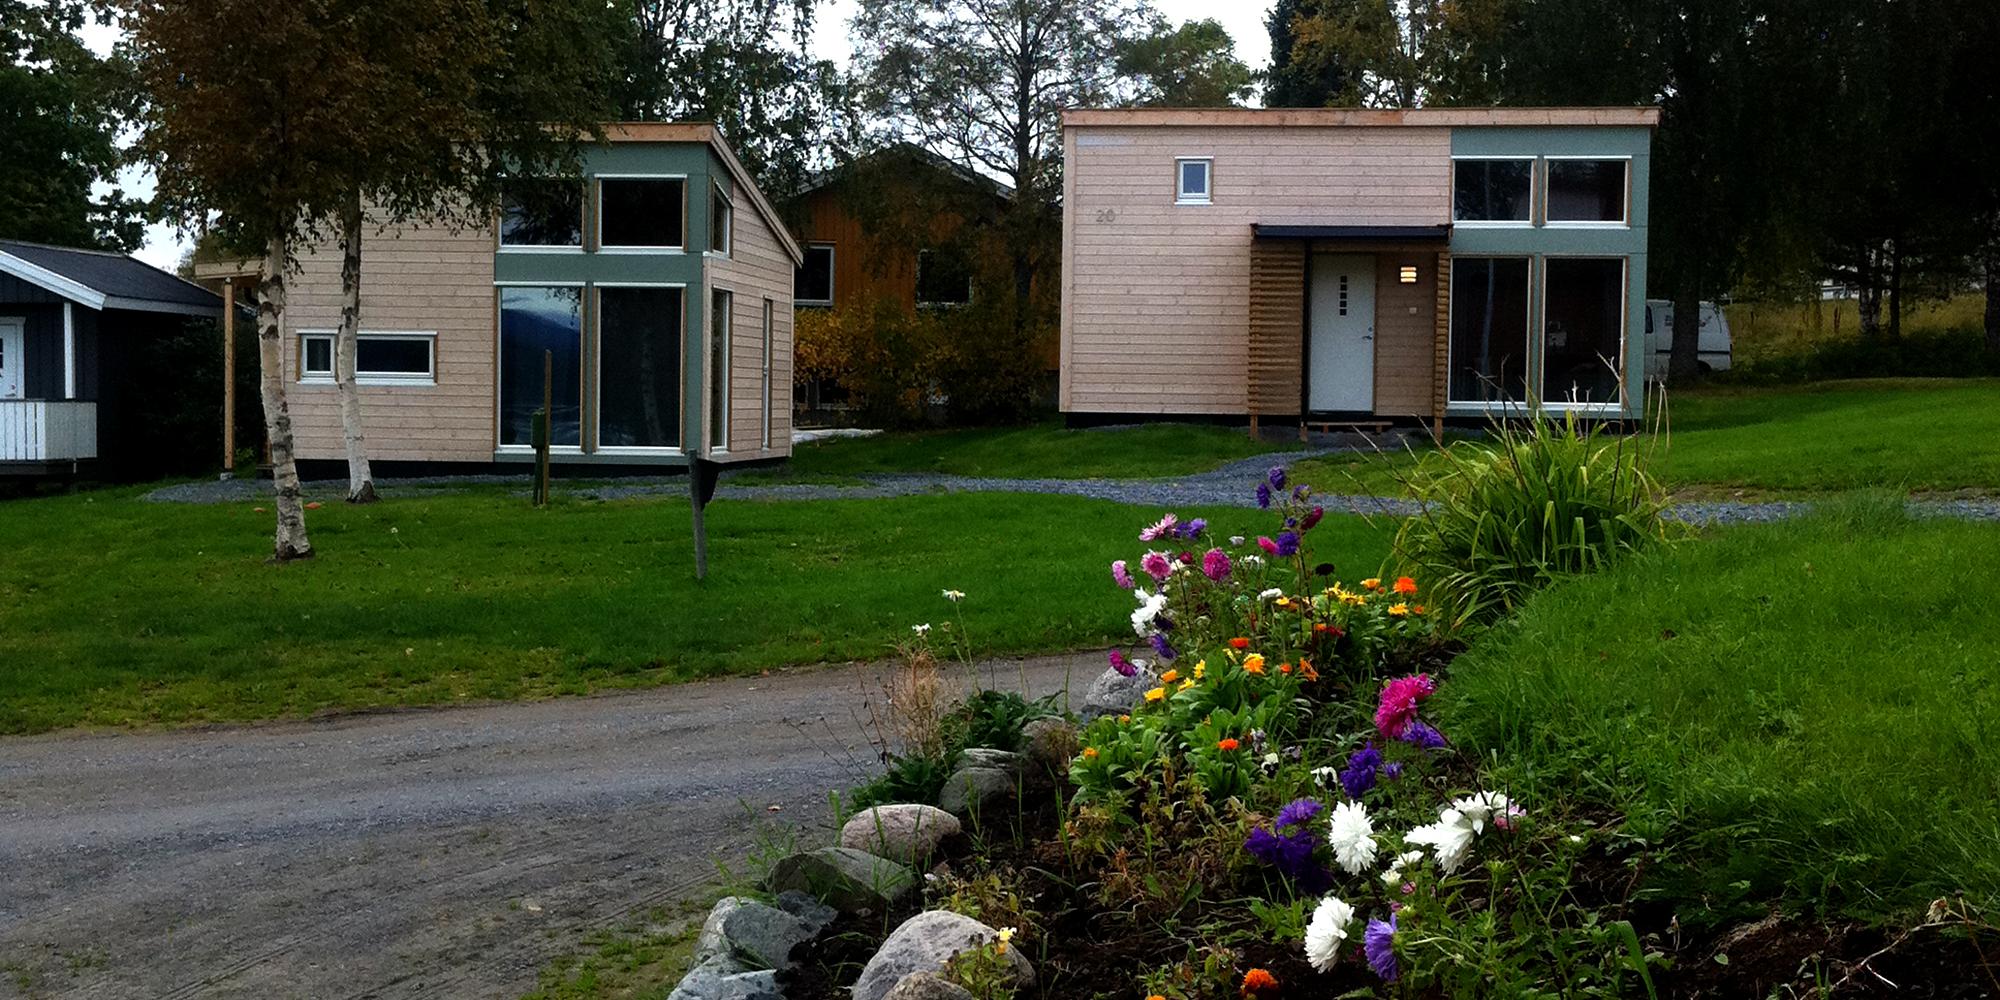 Kvam Motell og Camping - new cabins. Copyright: Kvam Motell og Camping